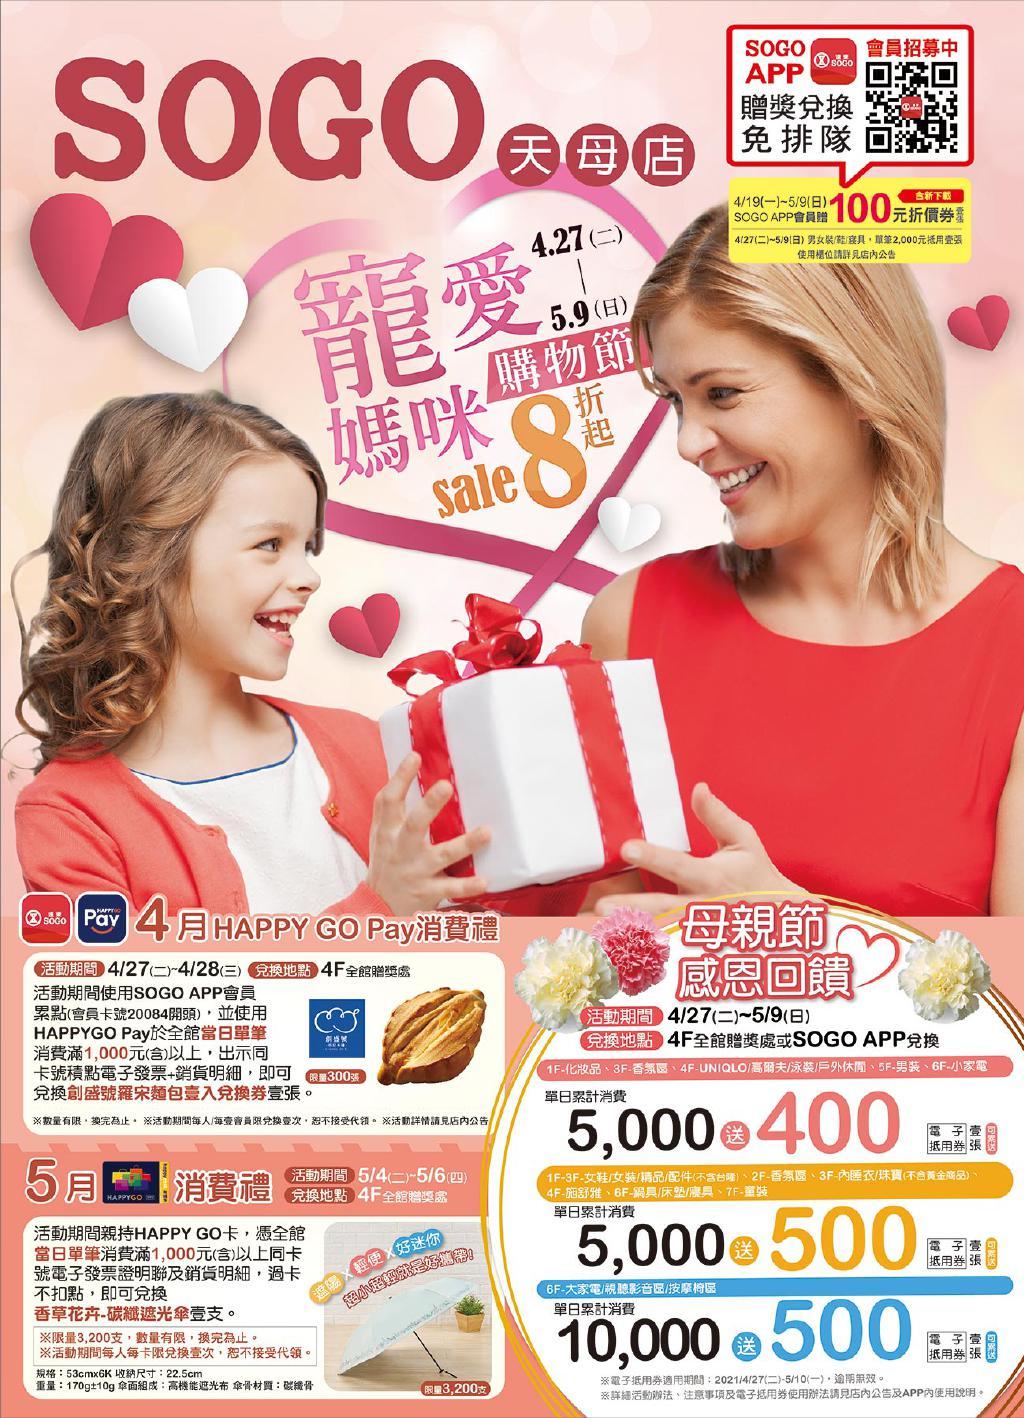 SOGO《天母店》DM「寵愛媽咪購物節 sale 8折起」【2021/5/9 止】